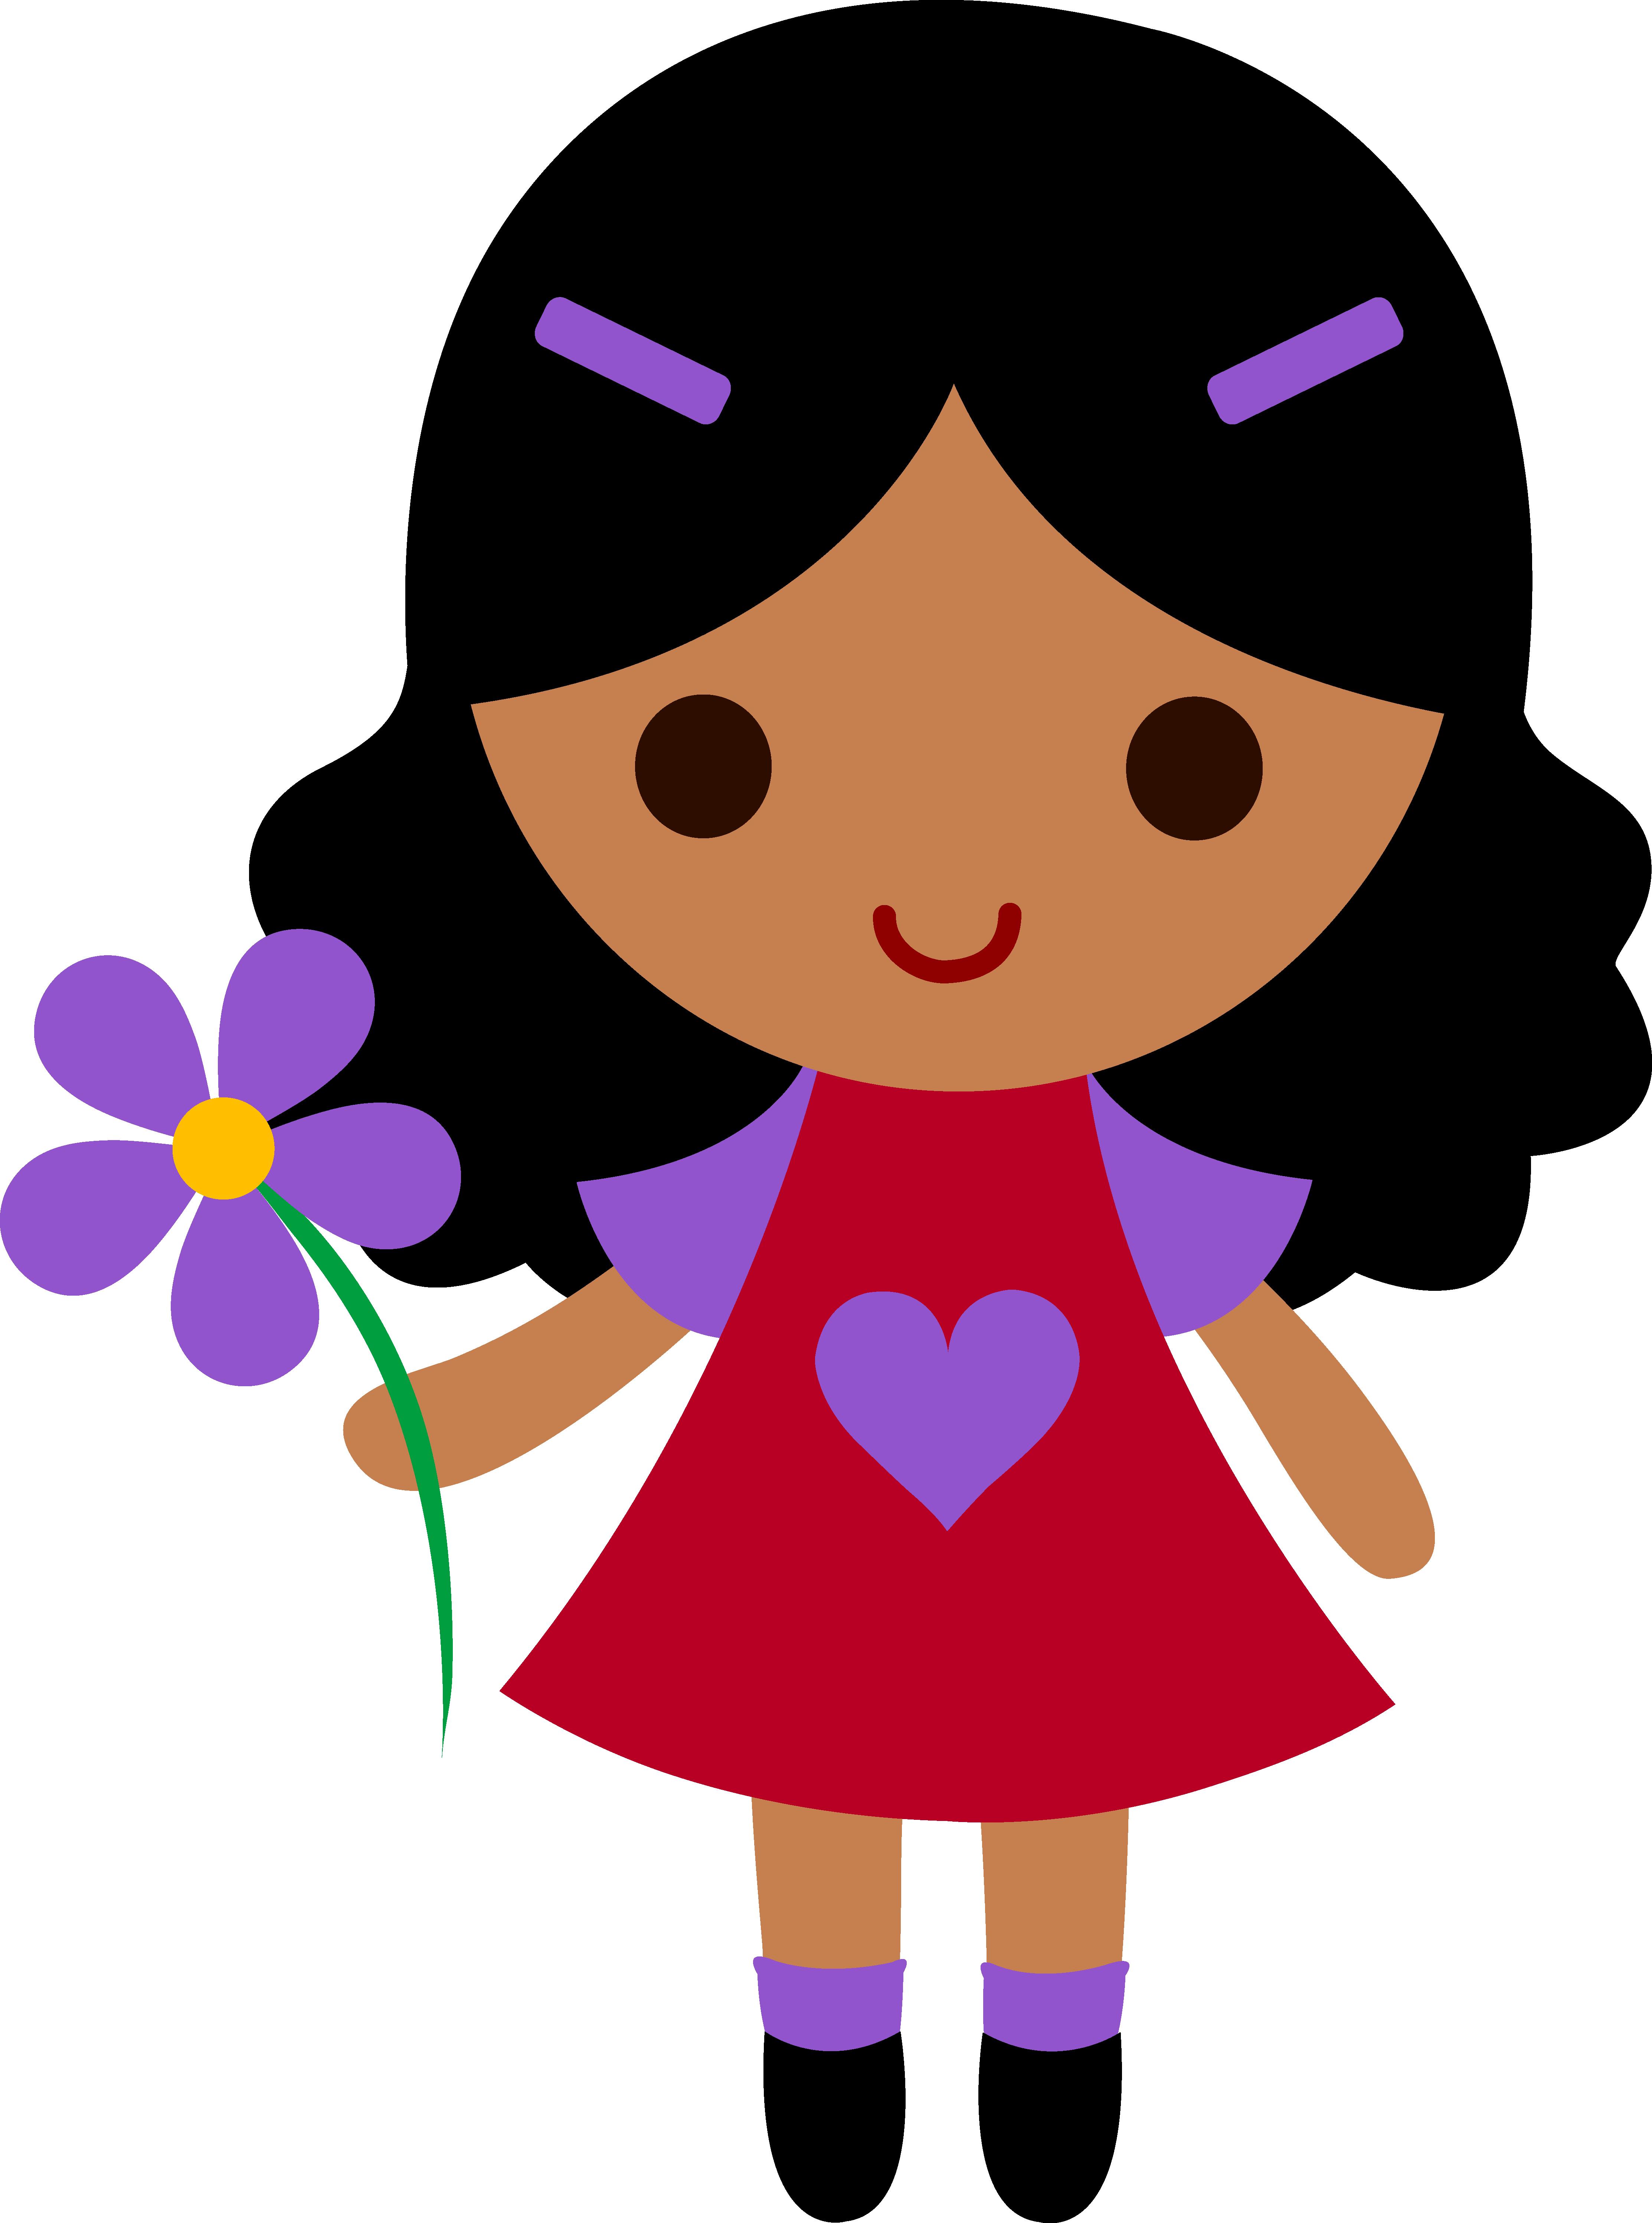 4451x5988 My Clip Art Of A Little Girl Holding A Purple Flower Sweet Clip